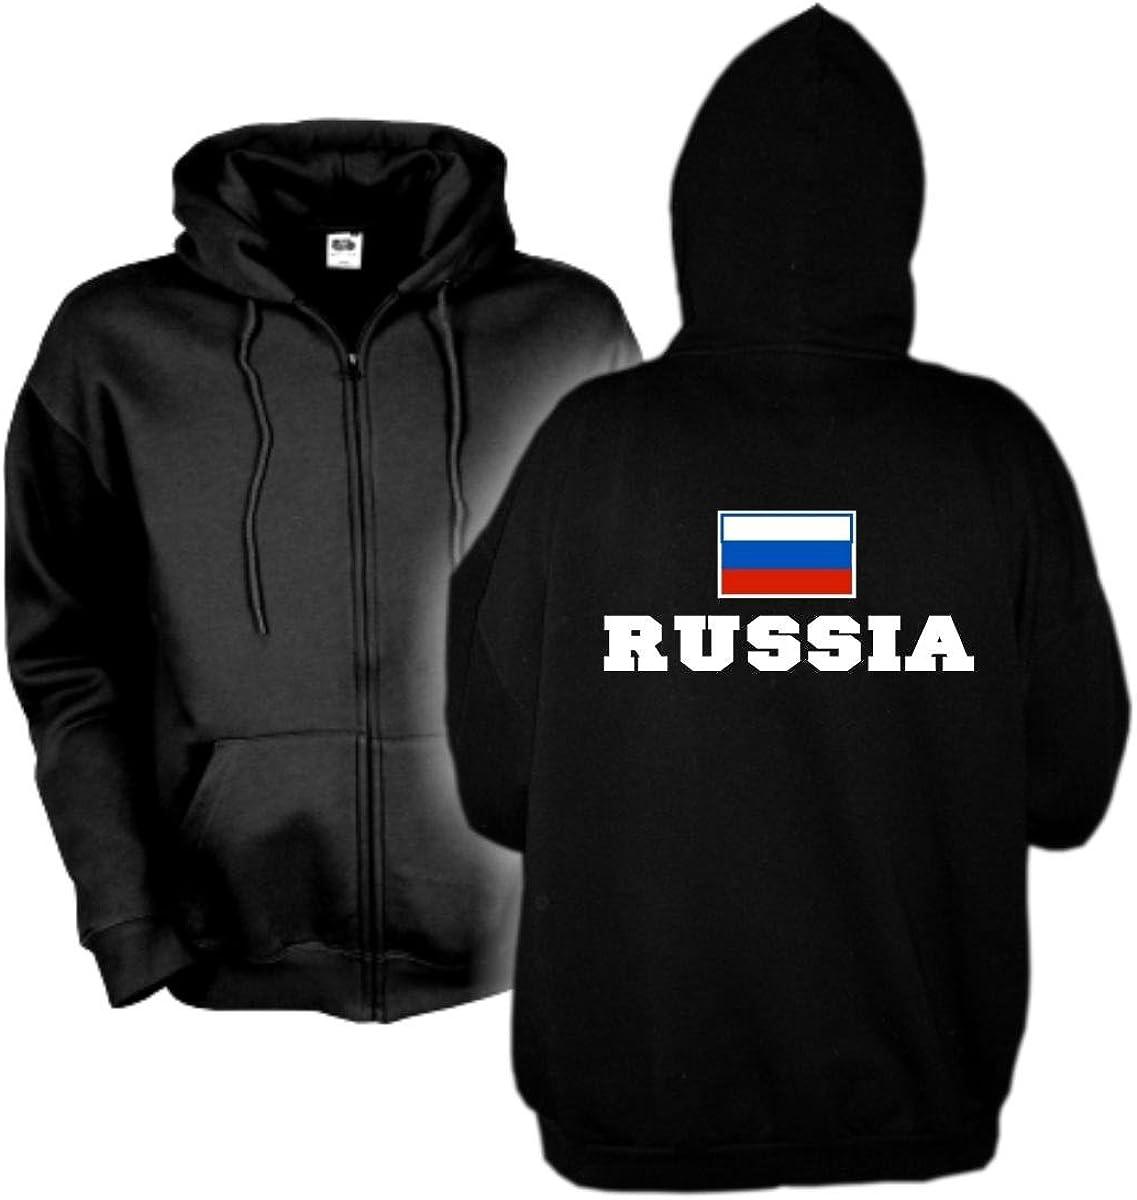 Kapuzenjacke Russland Russia, Flagshirt, bedrucktes Hoodie Kapuzensweat Kapuzenpulli mit Kängurutaschen große Größen S-6XL (WMS02-52e) Mehrfarbig